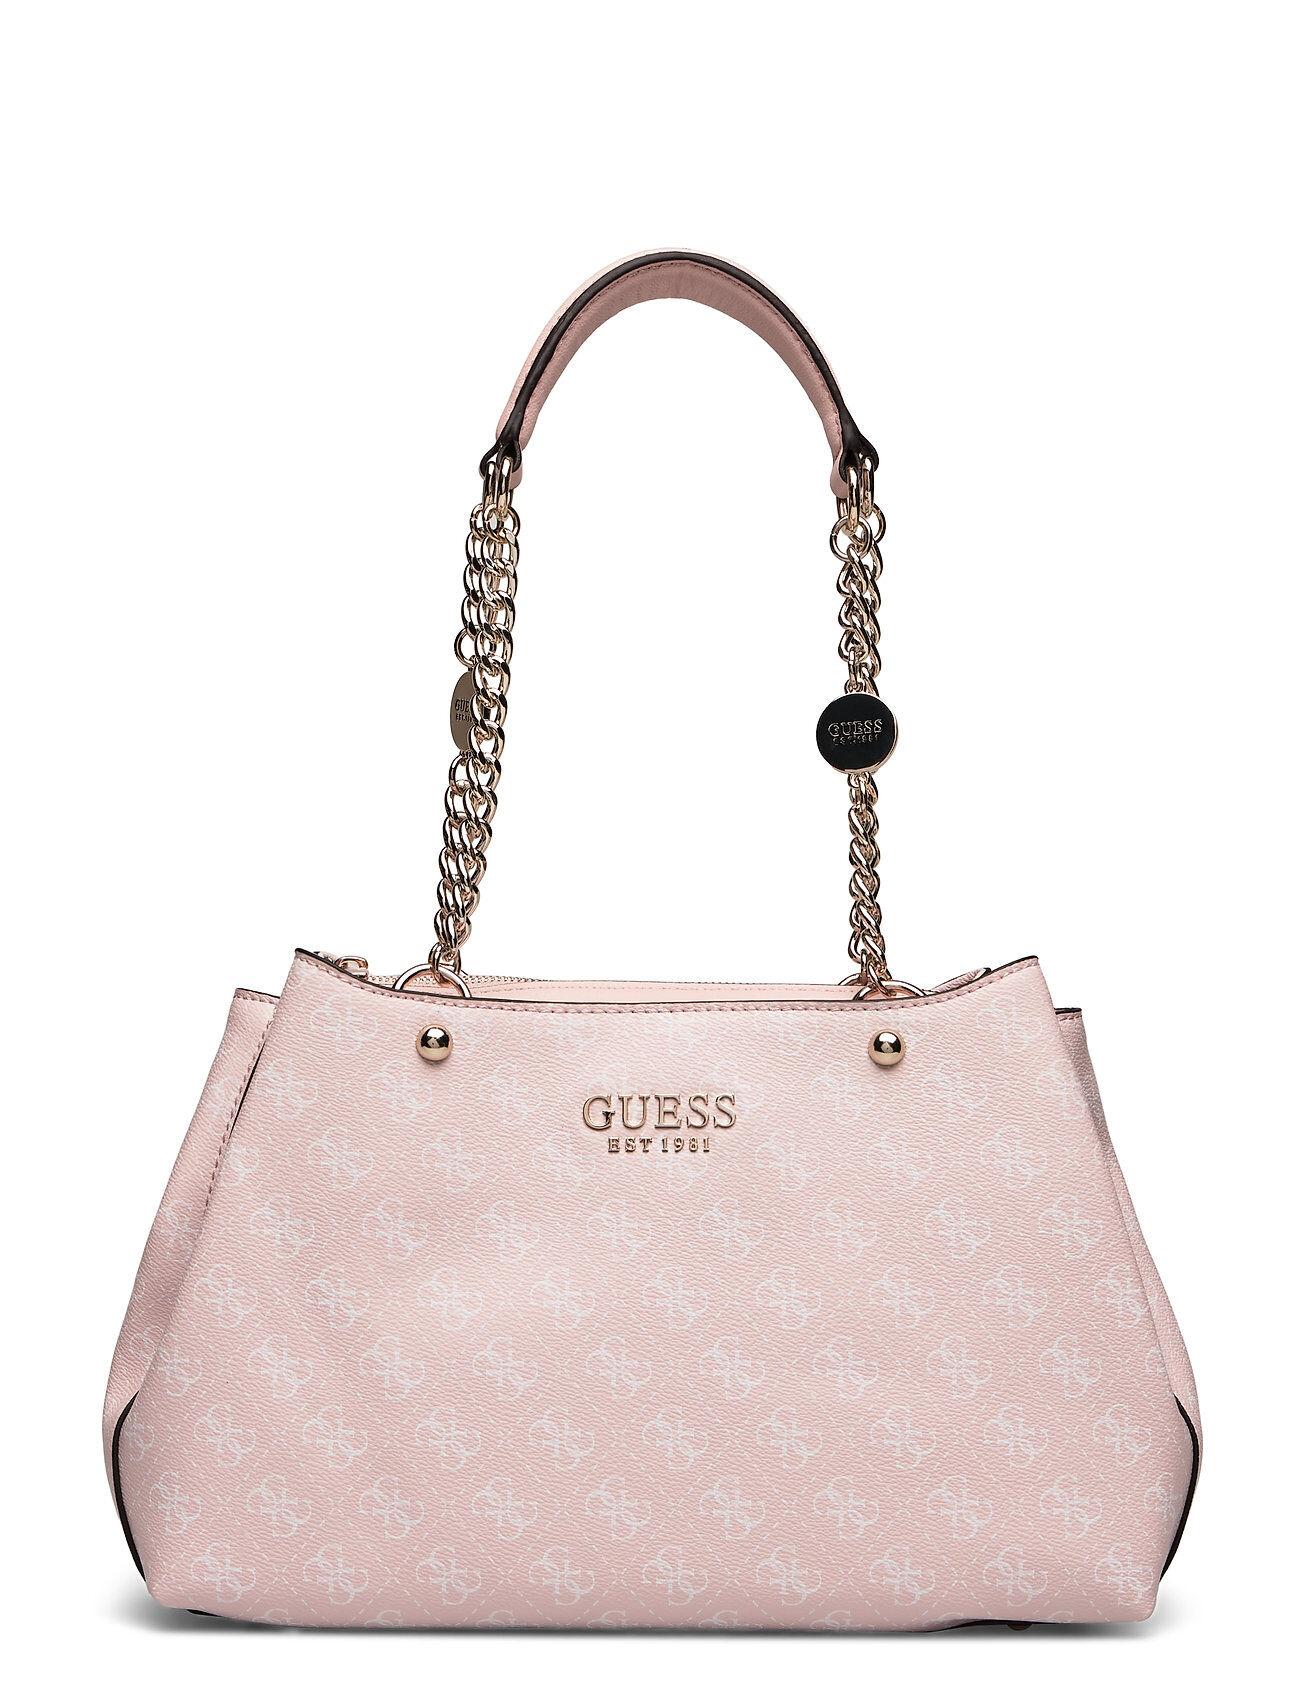 GUESS Lorenna Girlfriend Satchel Bags Top Handle Bags Rosa GUESS